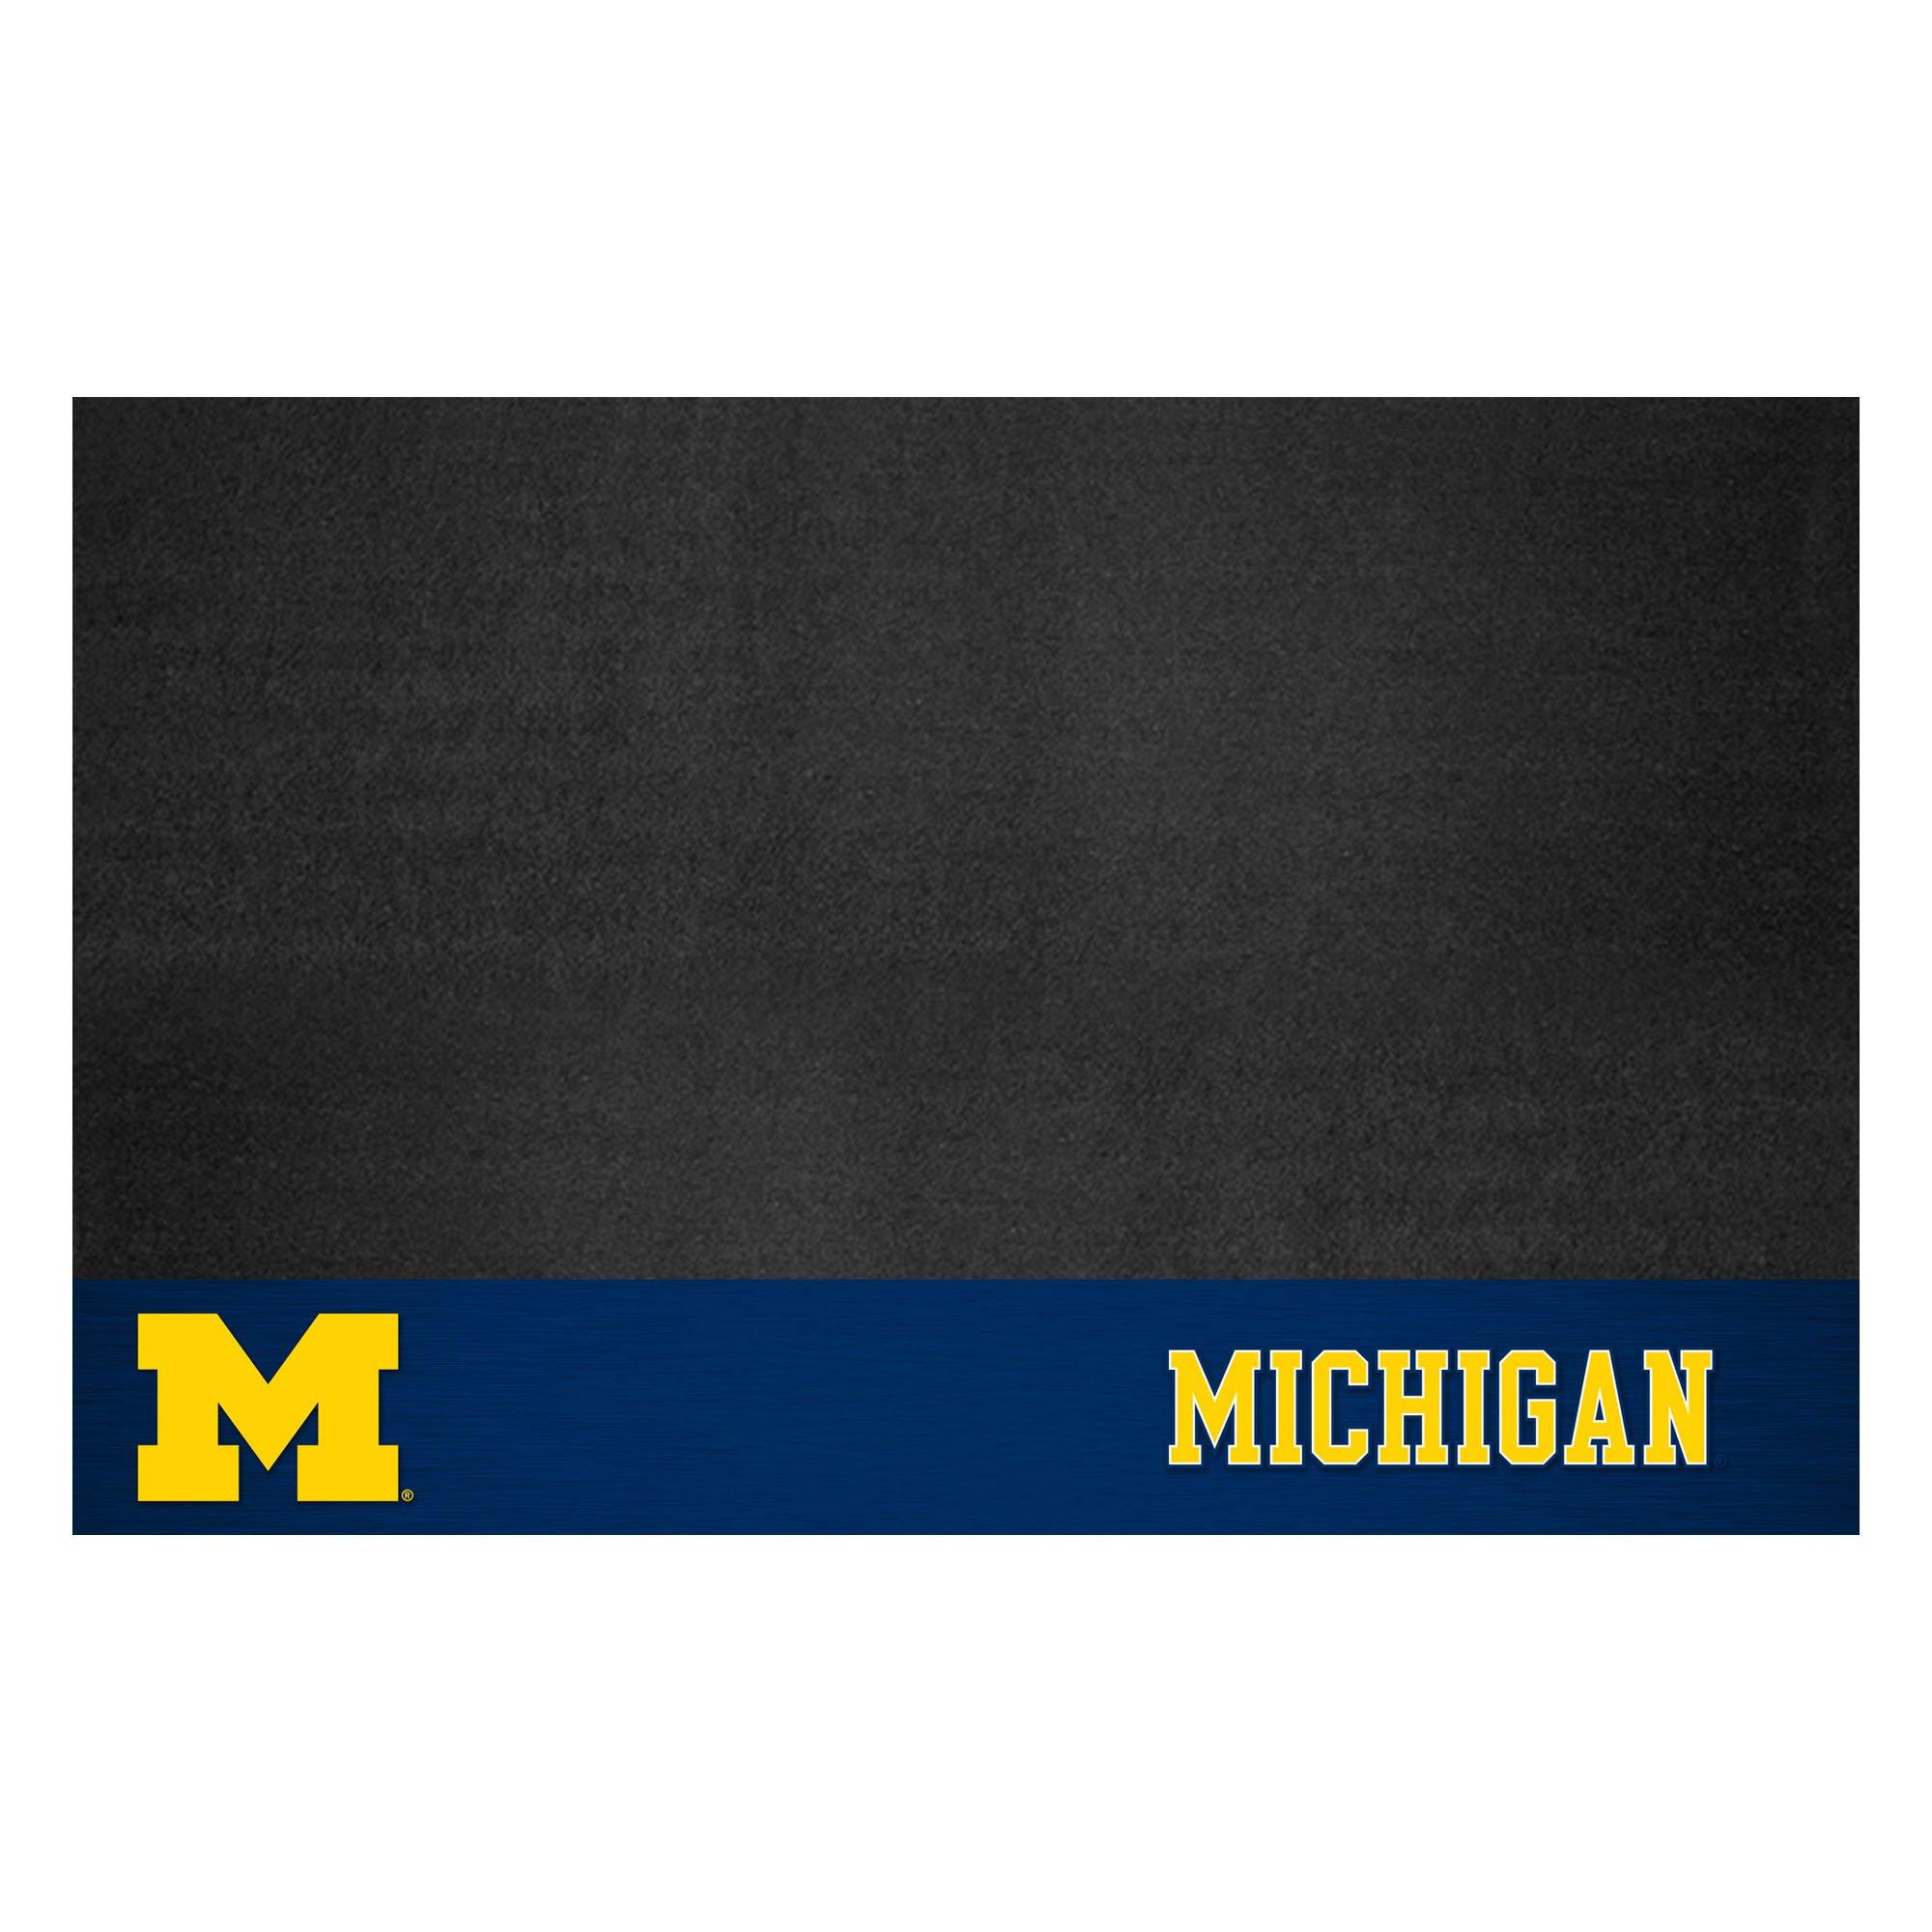 FANMATS NCAA University of Michigan Wolverines Vinyl Grill Mat by FANMATS